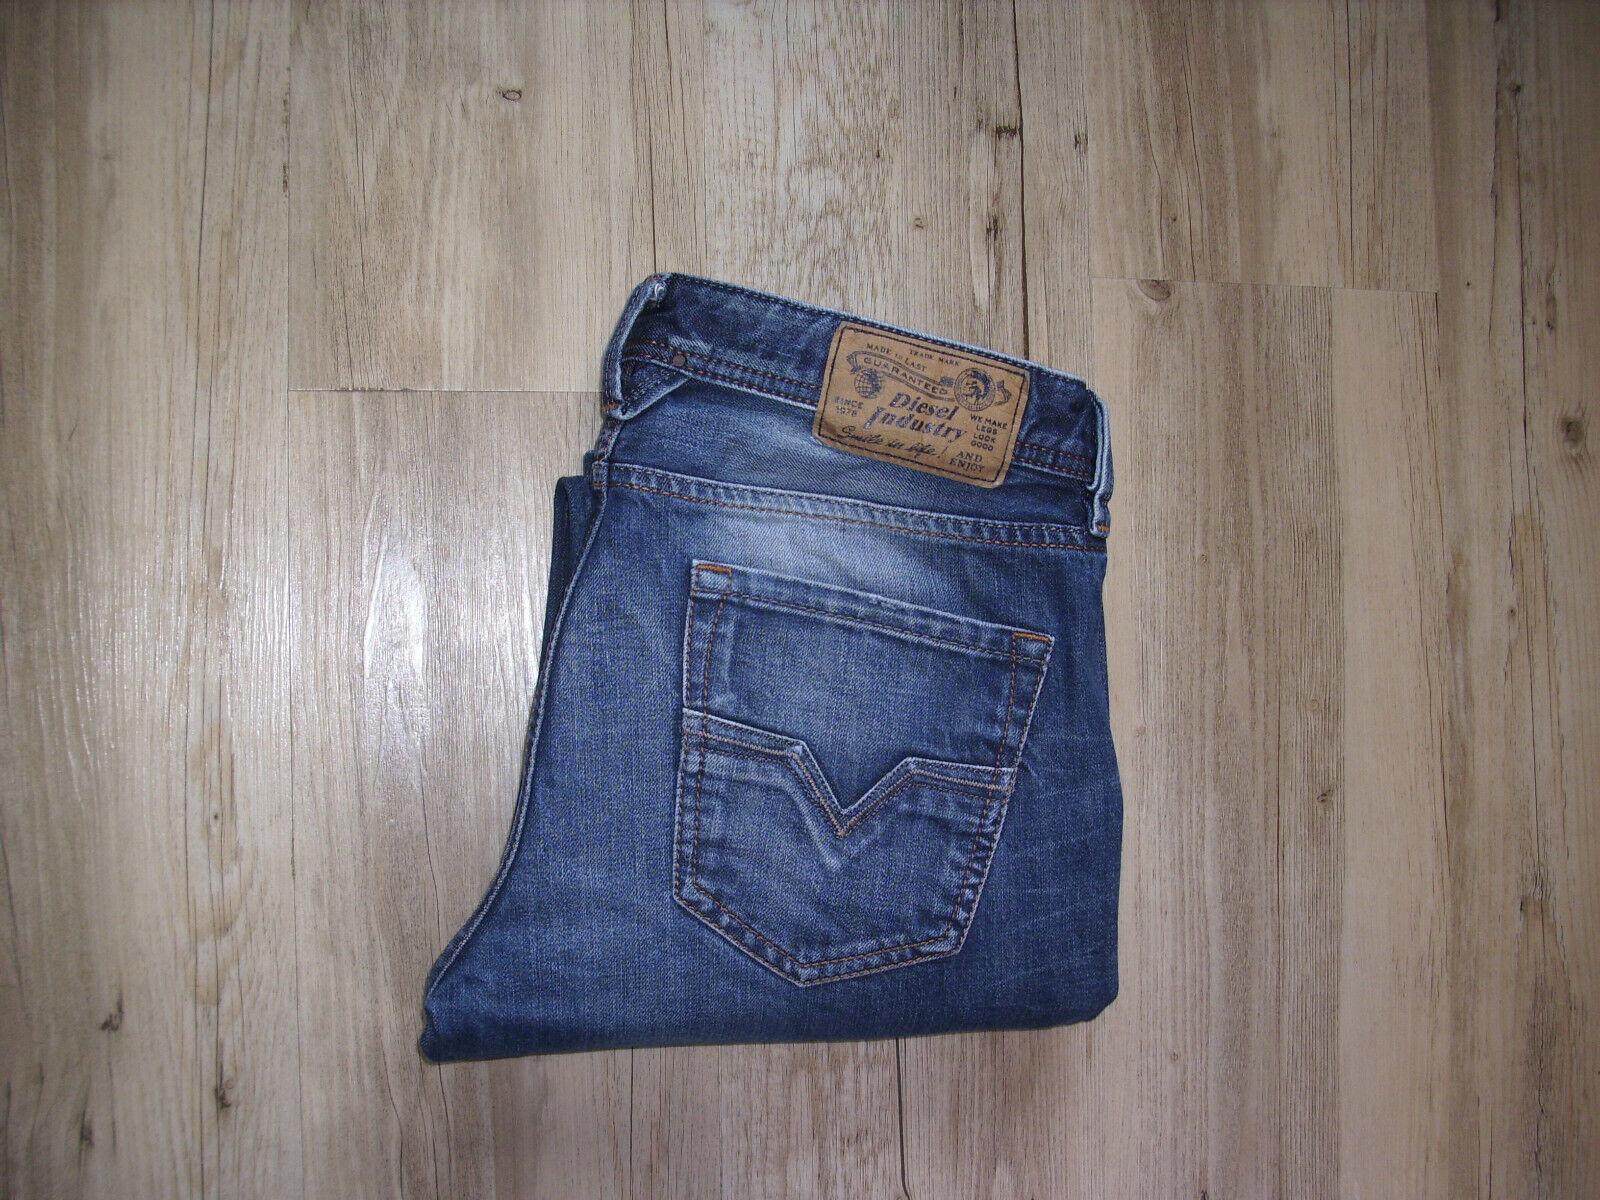 DIESEL LARKEE (0813T) Regular Straight Jeans W32 L32 DZL144